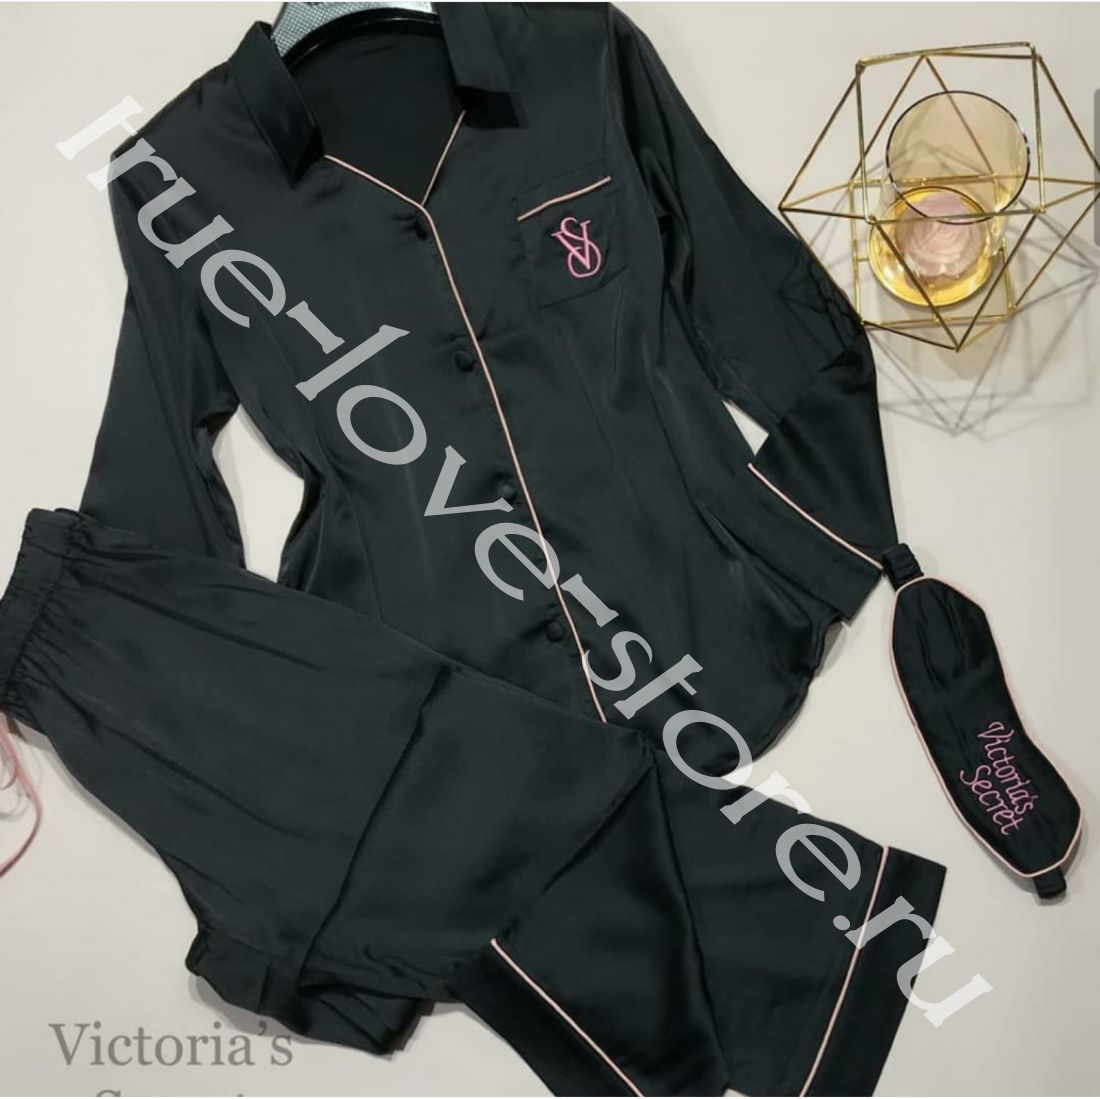 720118-Пижама двойка Victoria'S Secret(+маска для сна)